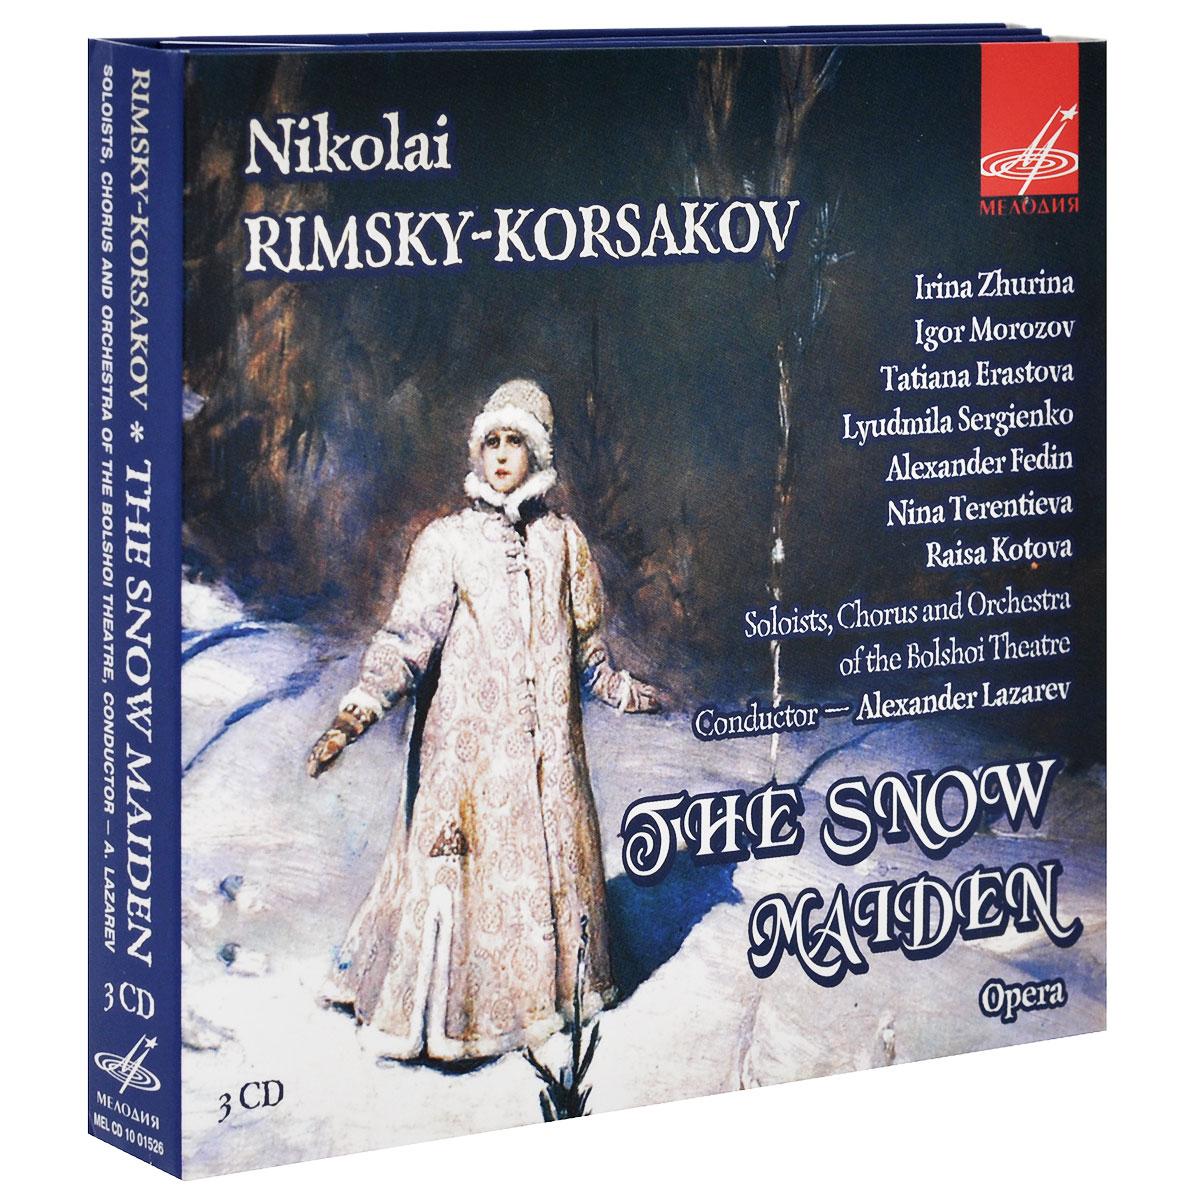 Zakazat.ru Alexander Lazarev. Nikolai Rimsky-Korsakov. The Snow Maiden (3 CD)